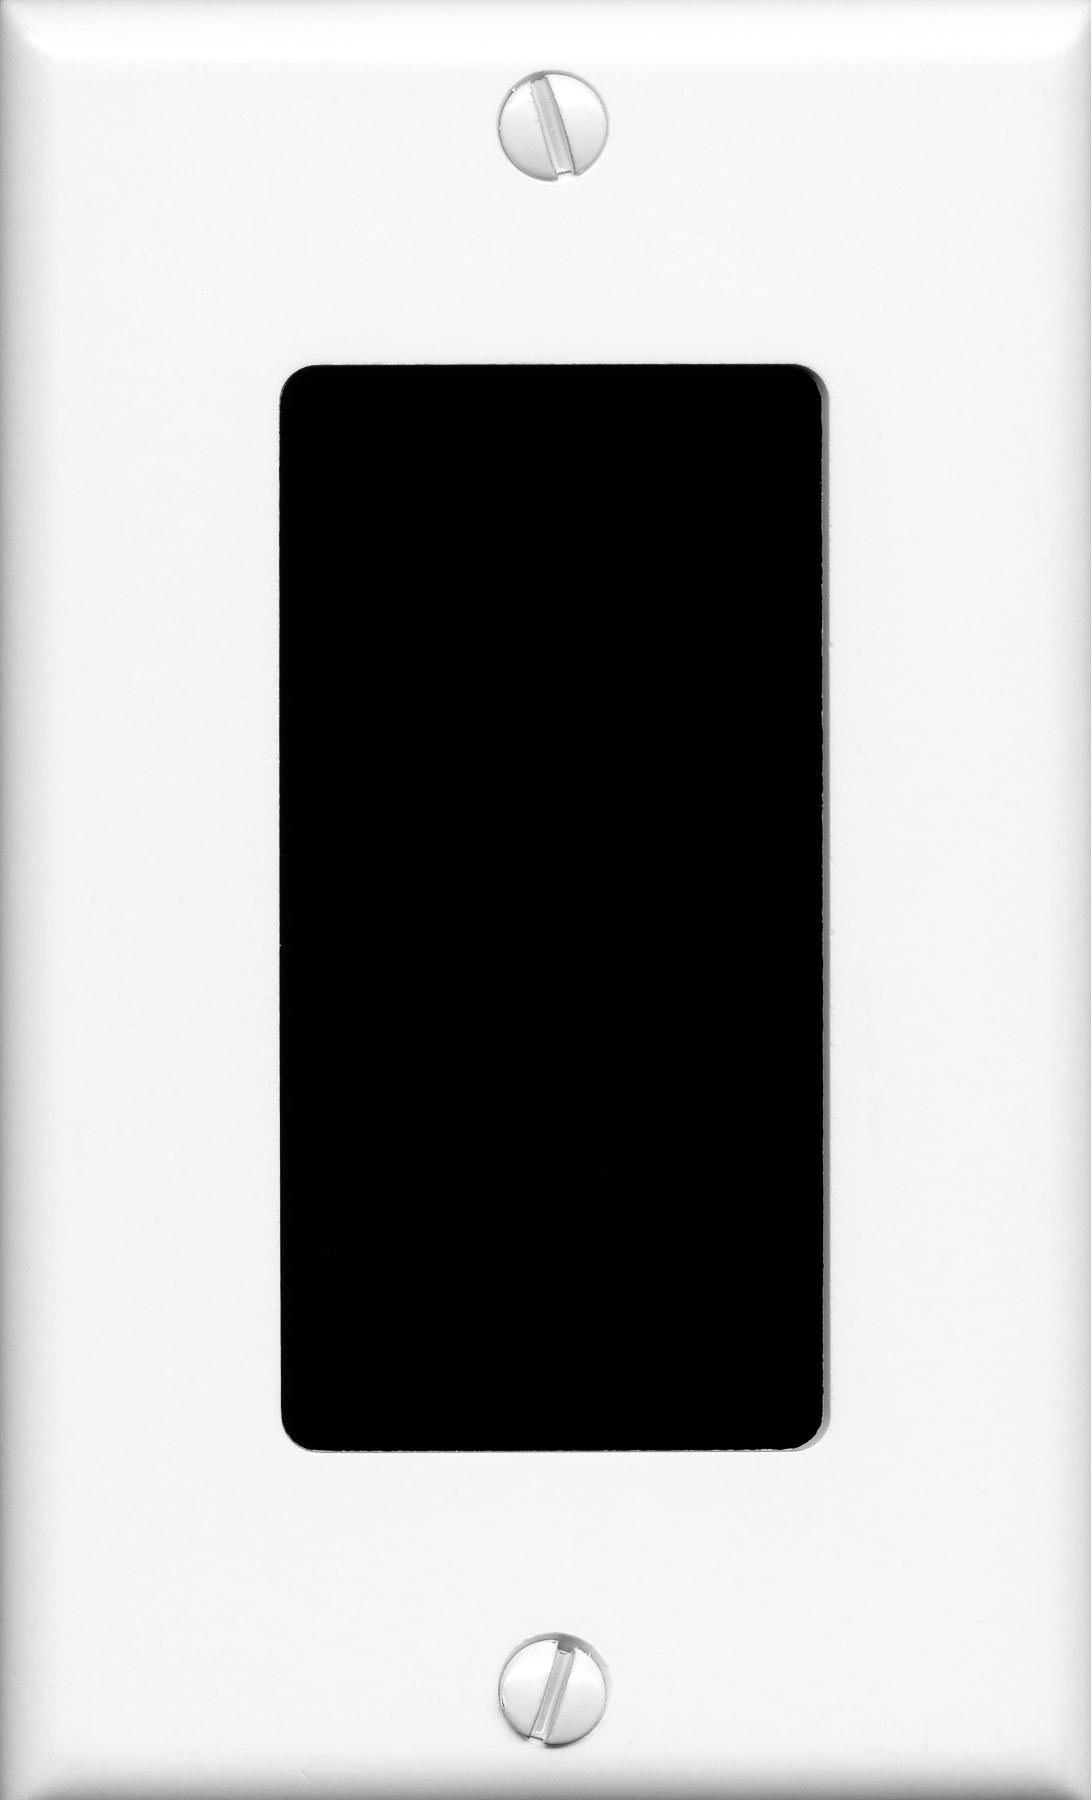 Light Switch Panel, Black, Picture, Rectangle, Rectangular, HQ Photo